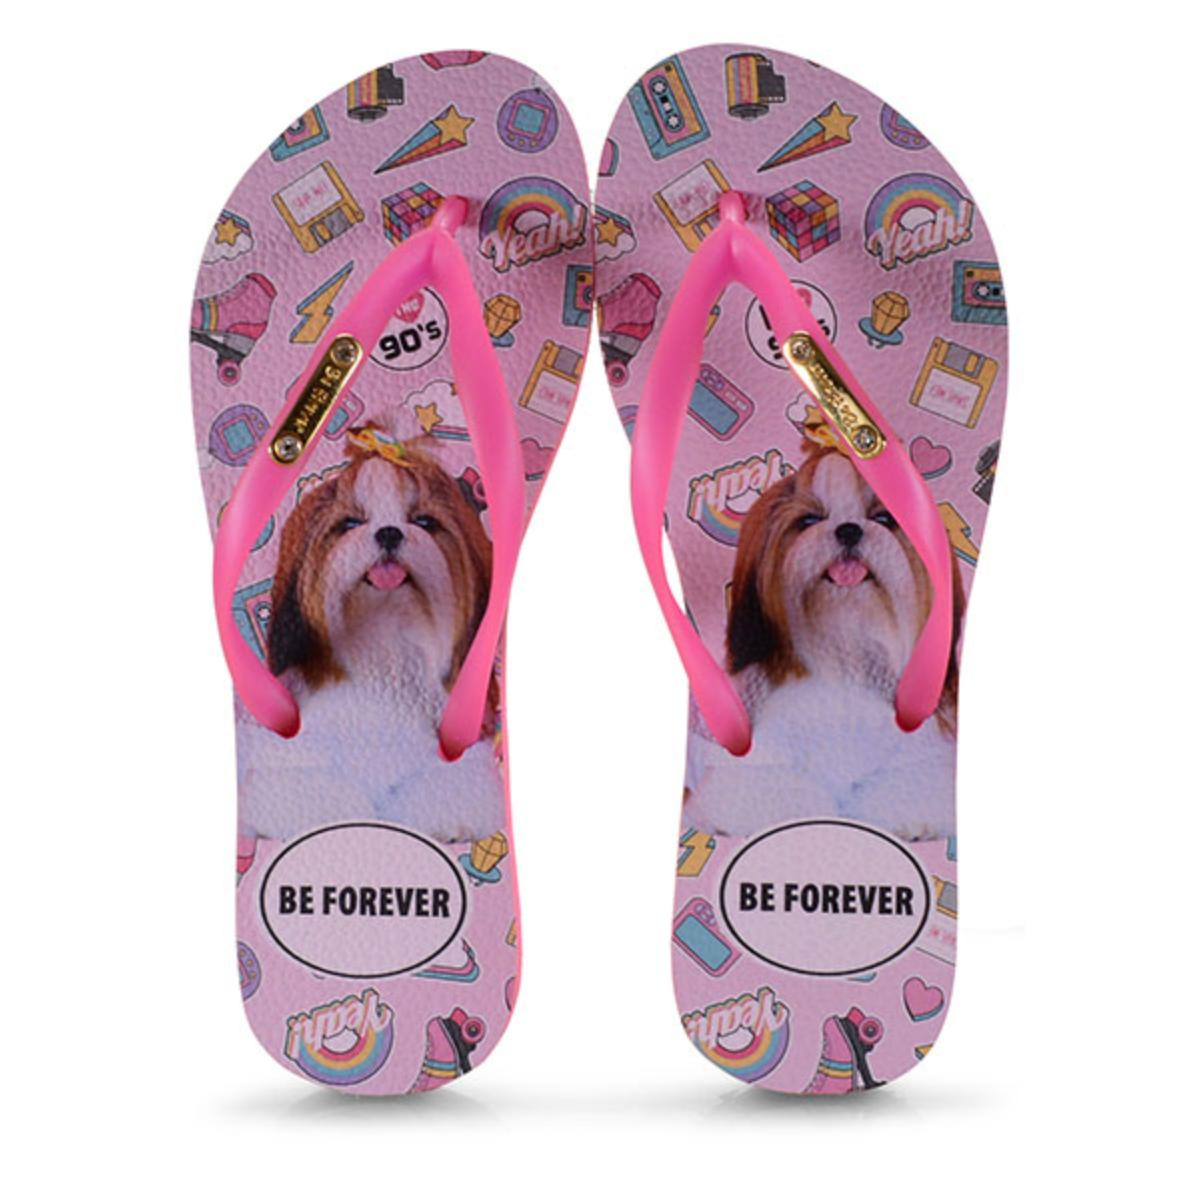 Chinelo Feminino Rafitthy 110.01702 Shitzu 90s Pink